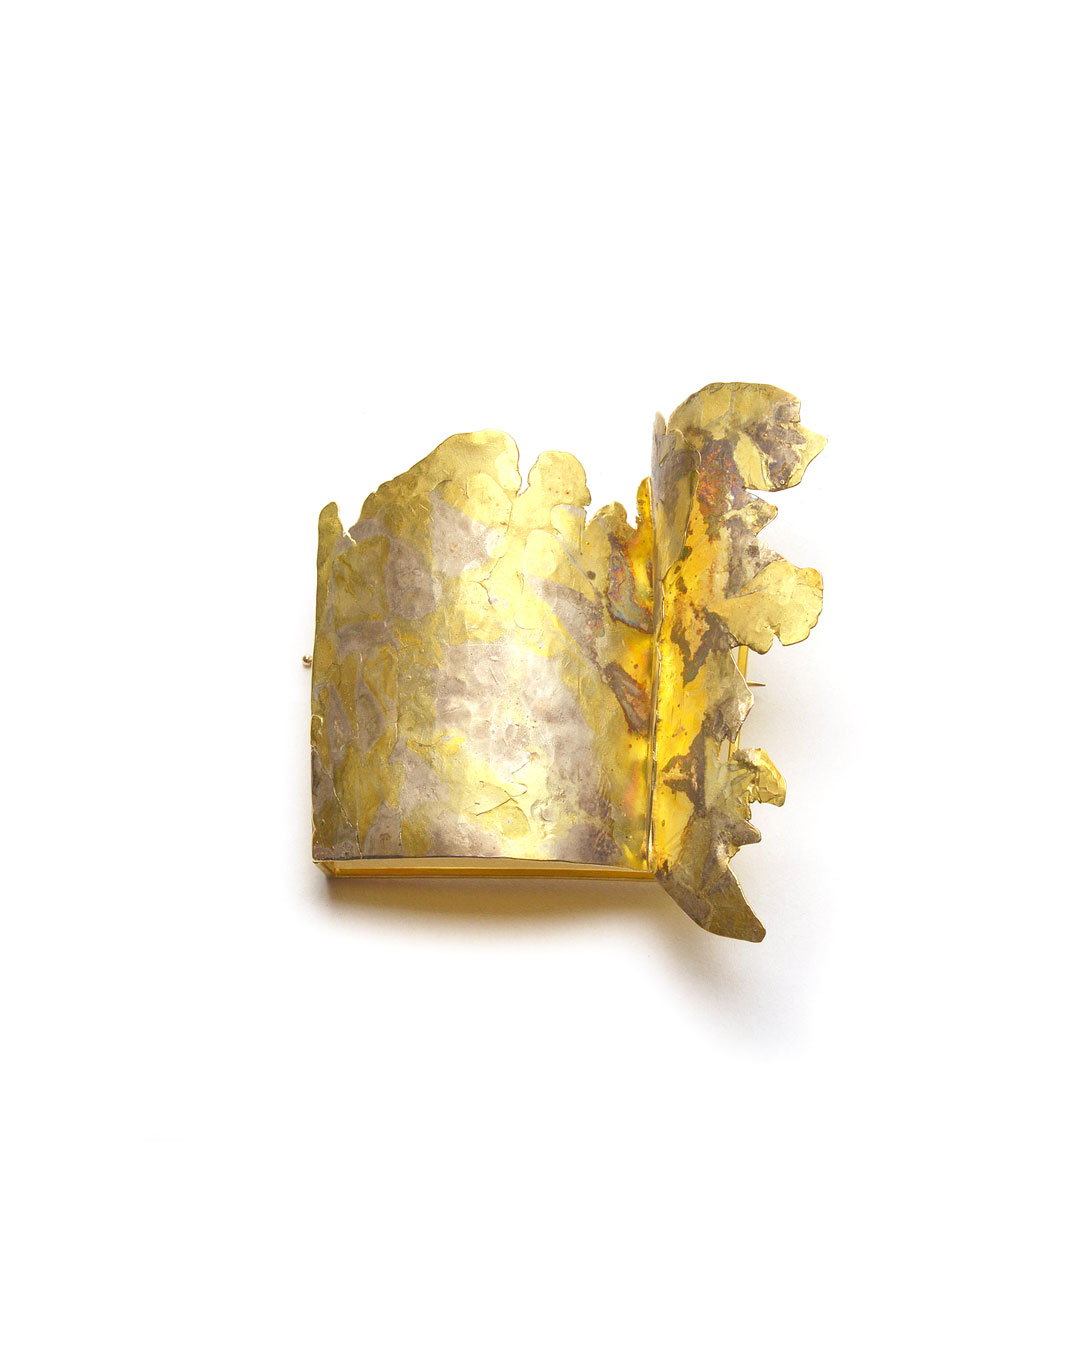 Stefano Marchetti, untitled, 2004, brooch; gold, silver, 60 x 60 x 25 mm, €8500